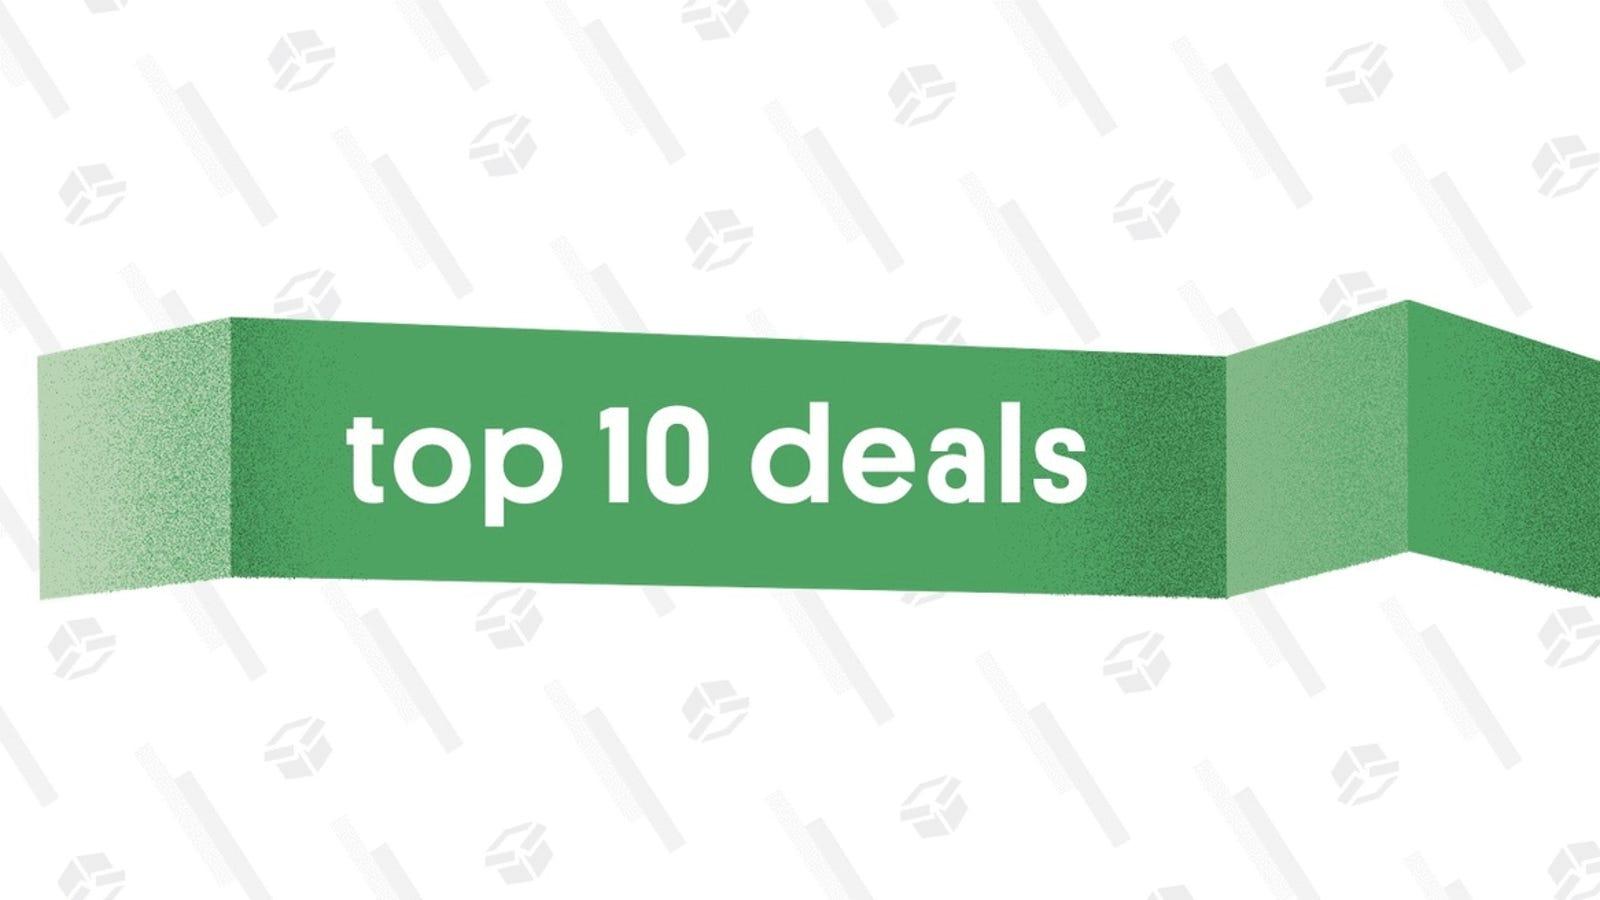 The 10 Best Deals of September 20, 2018